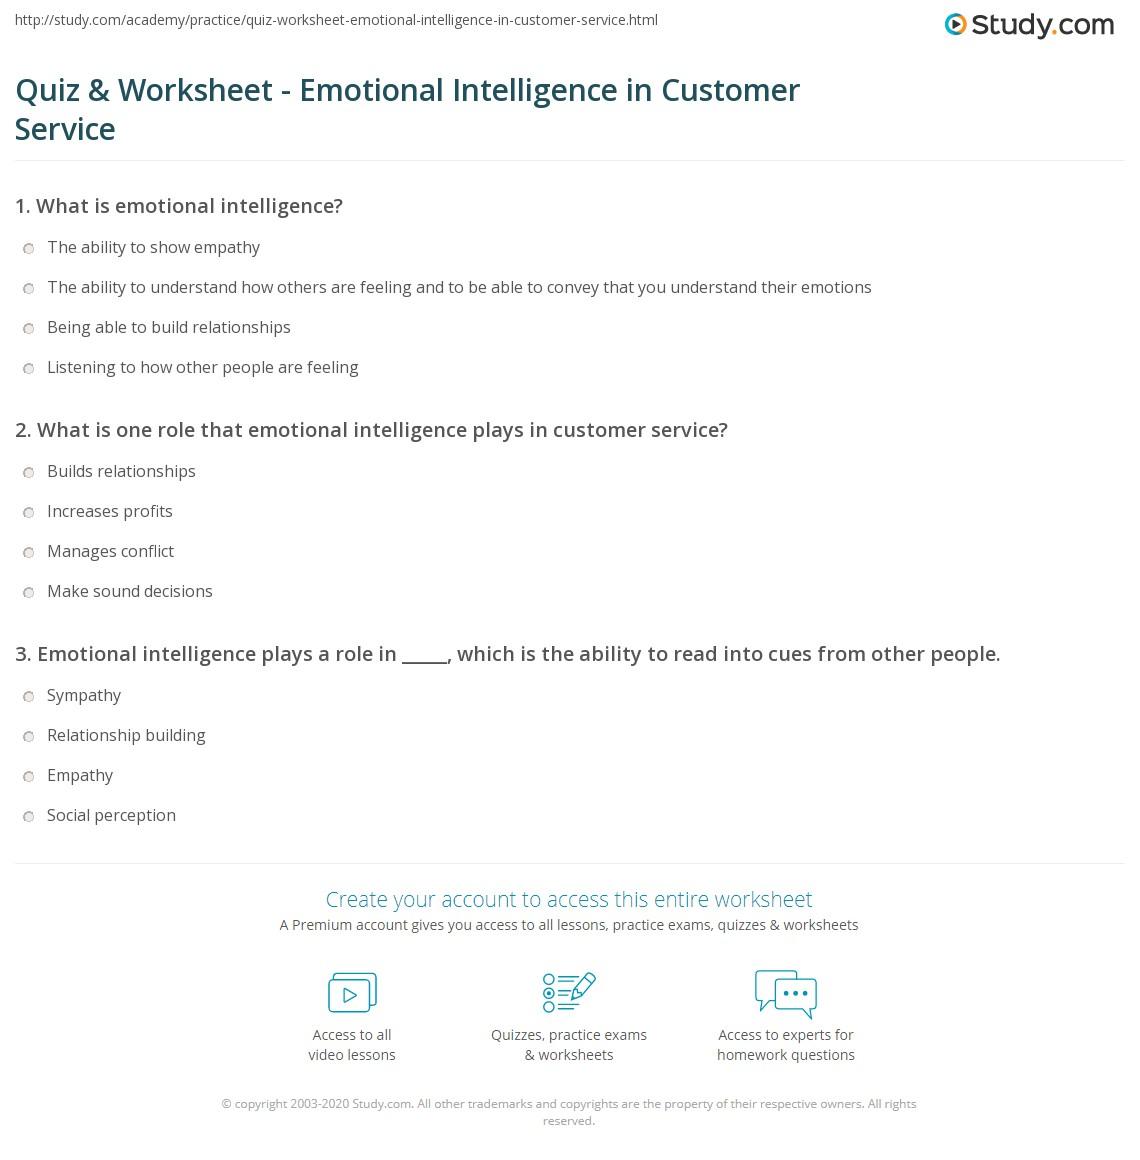 Quiz & Worksheet - Emotional Intelligence in Customer Service